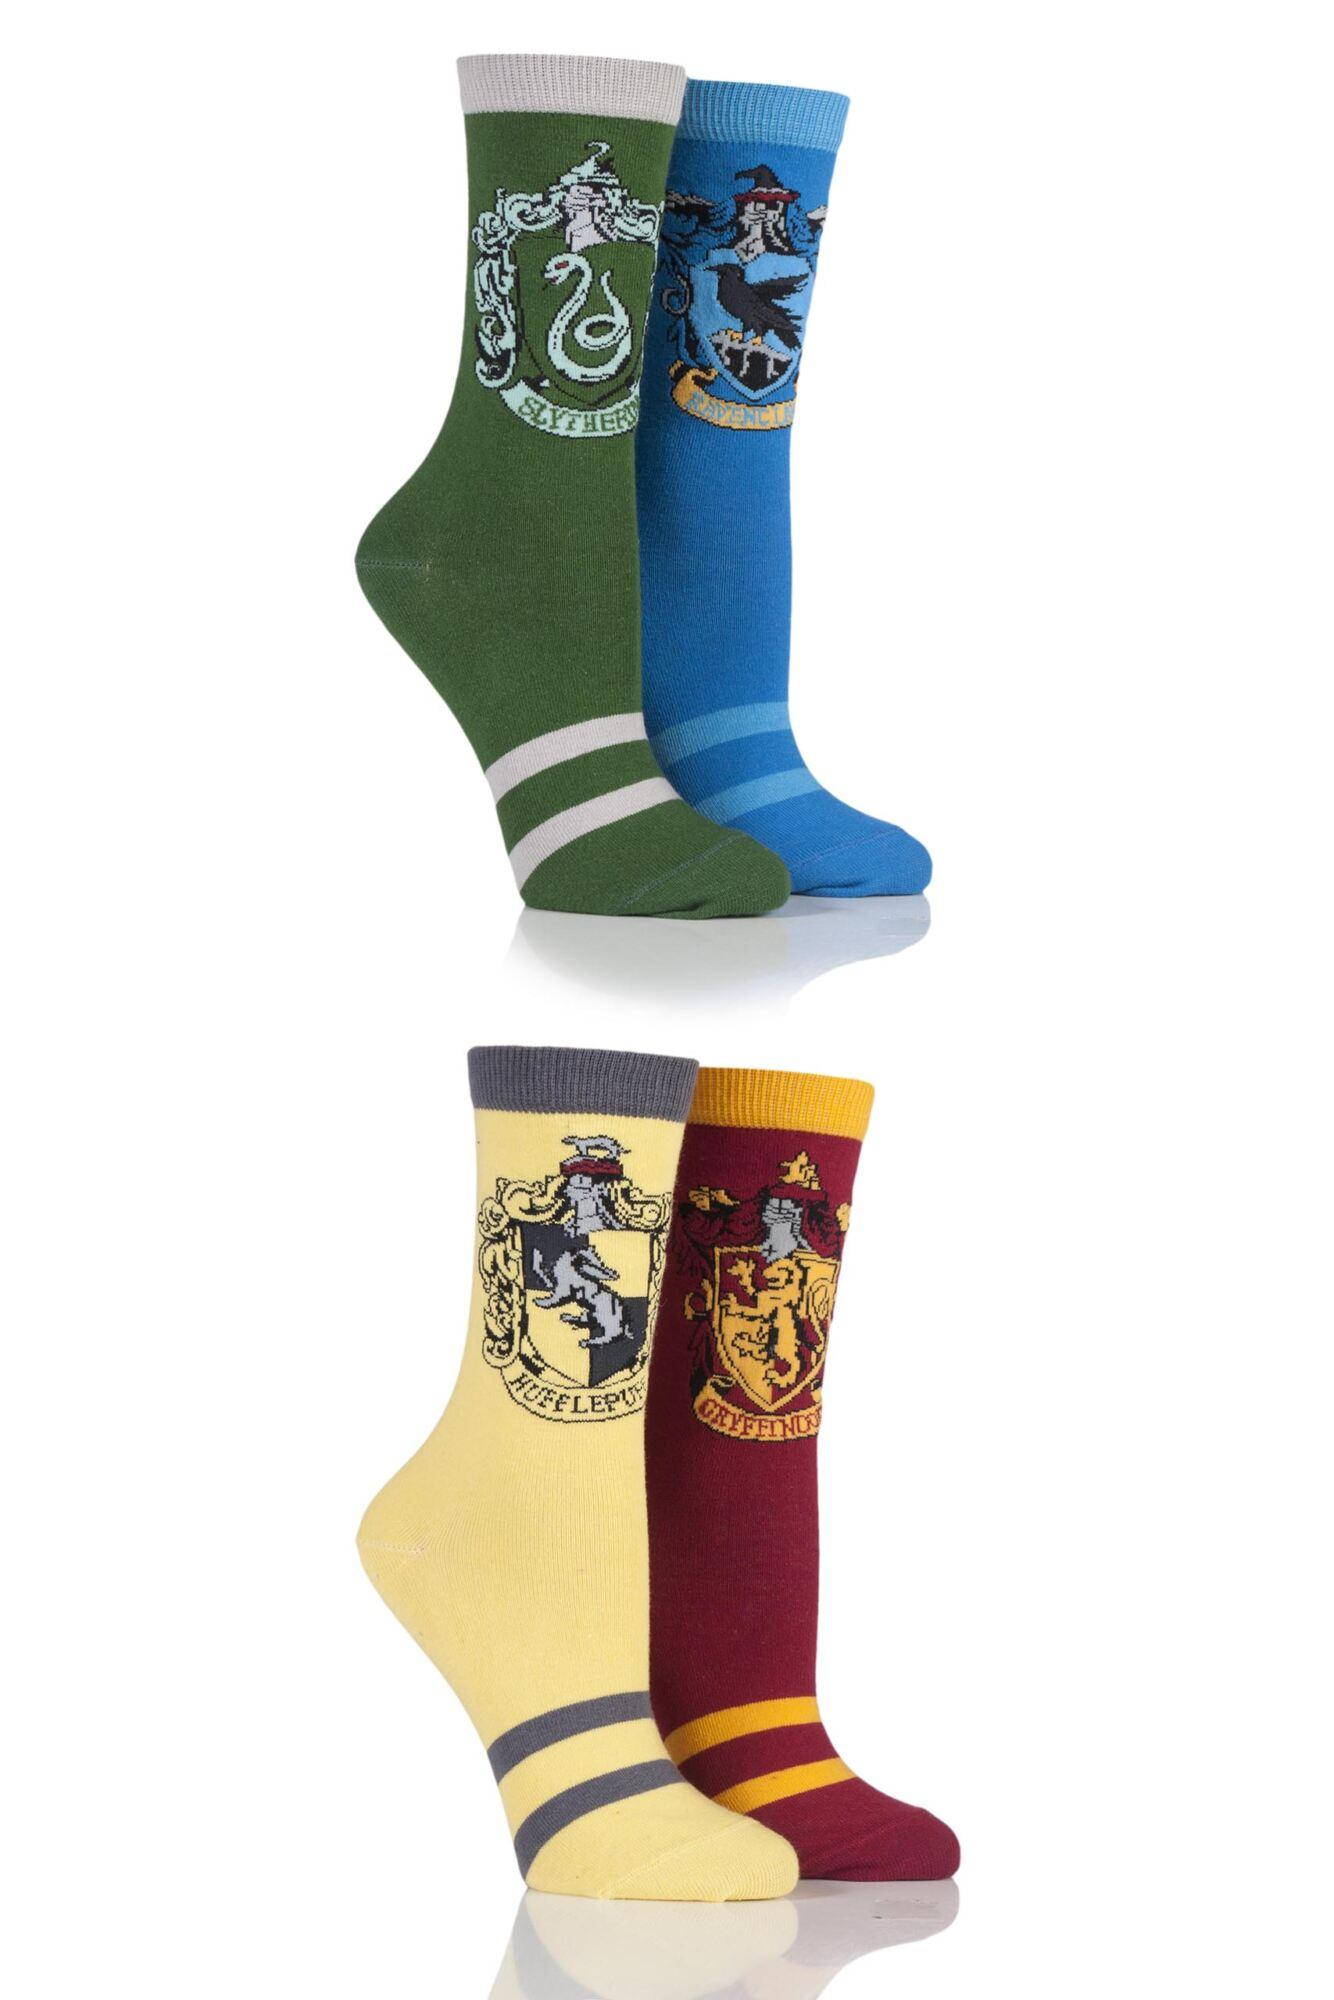 4 Pair Harry Potter House Badge Socks Ladies - Film & TV Characters